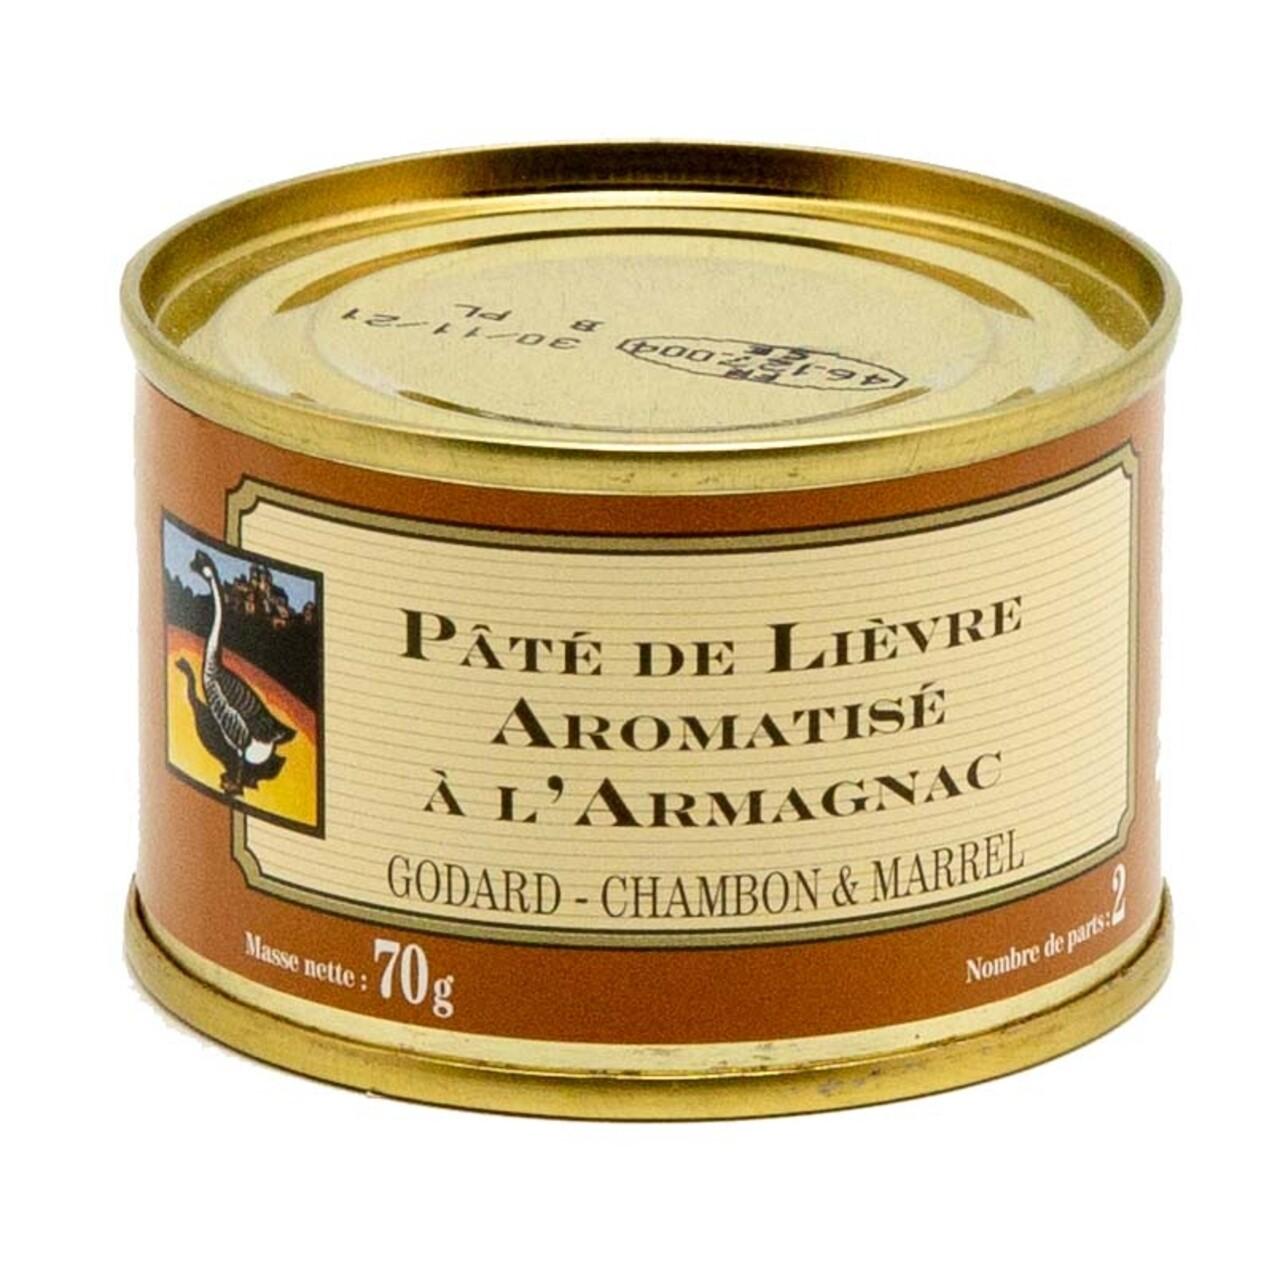 Pate de iepure cu Armagnac, Godard Chambon & Marell, 70g